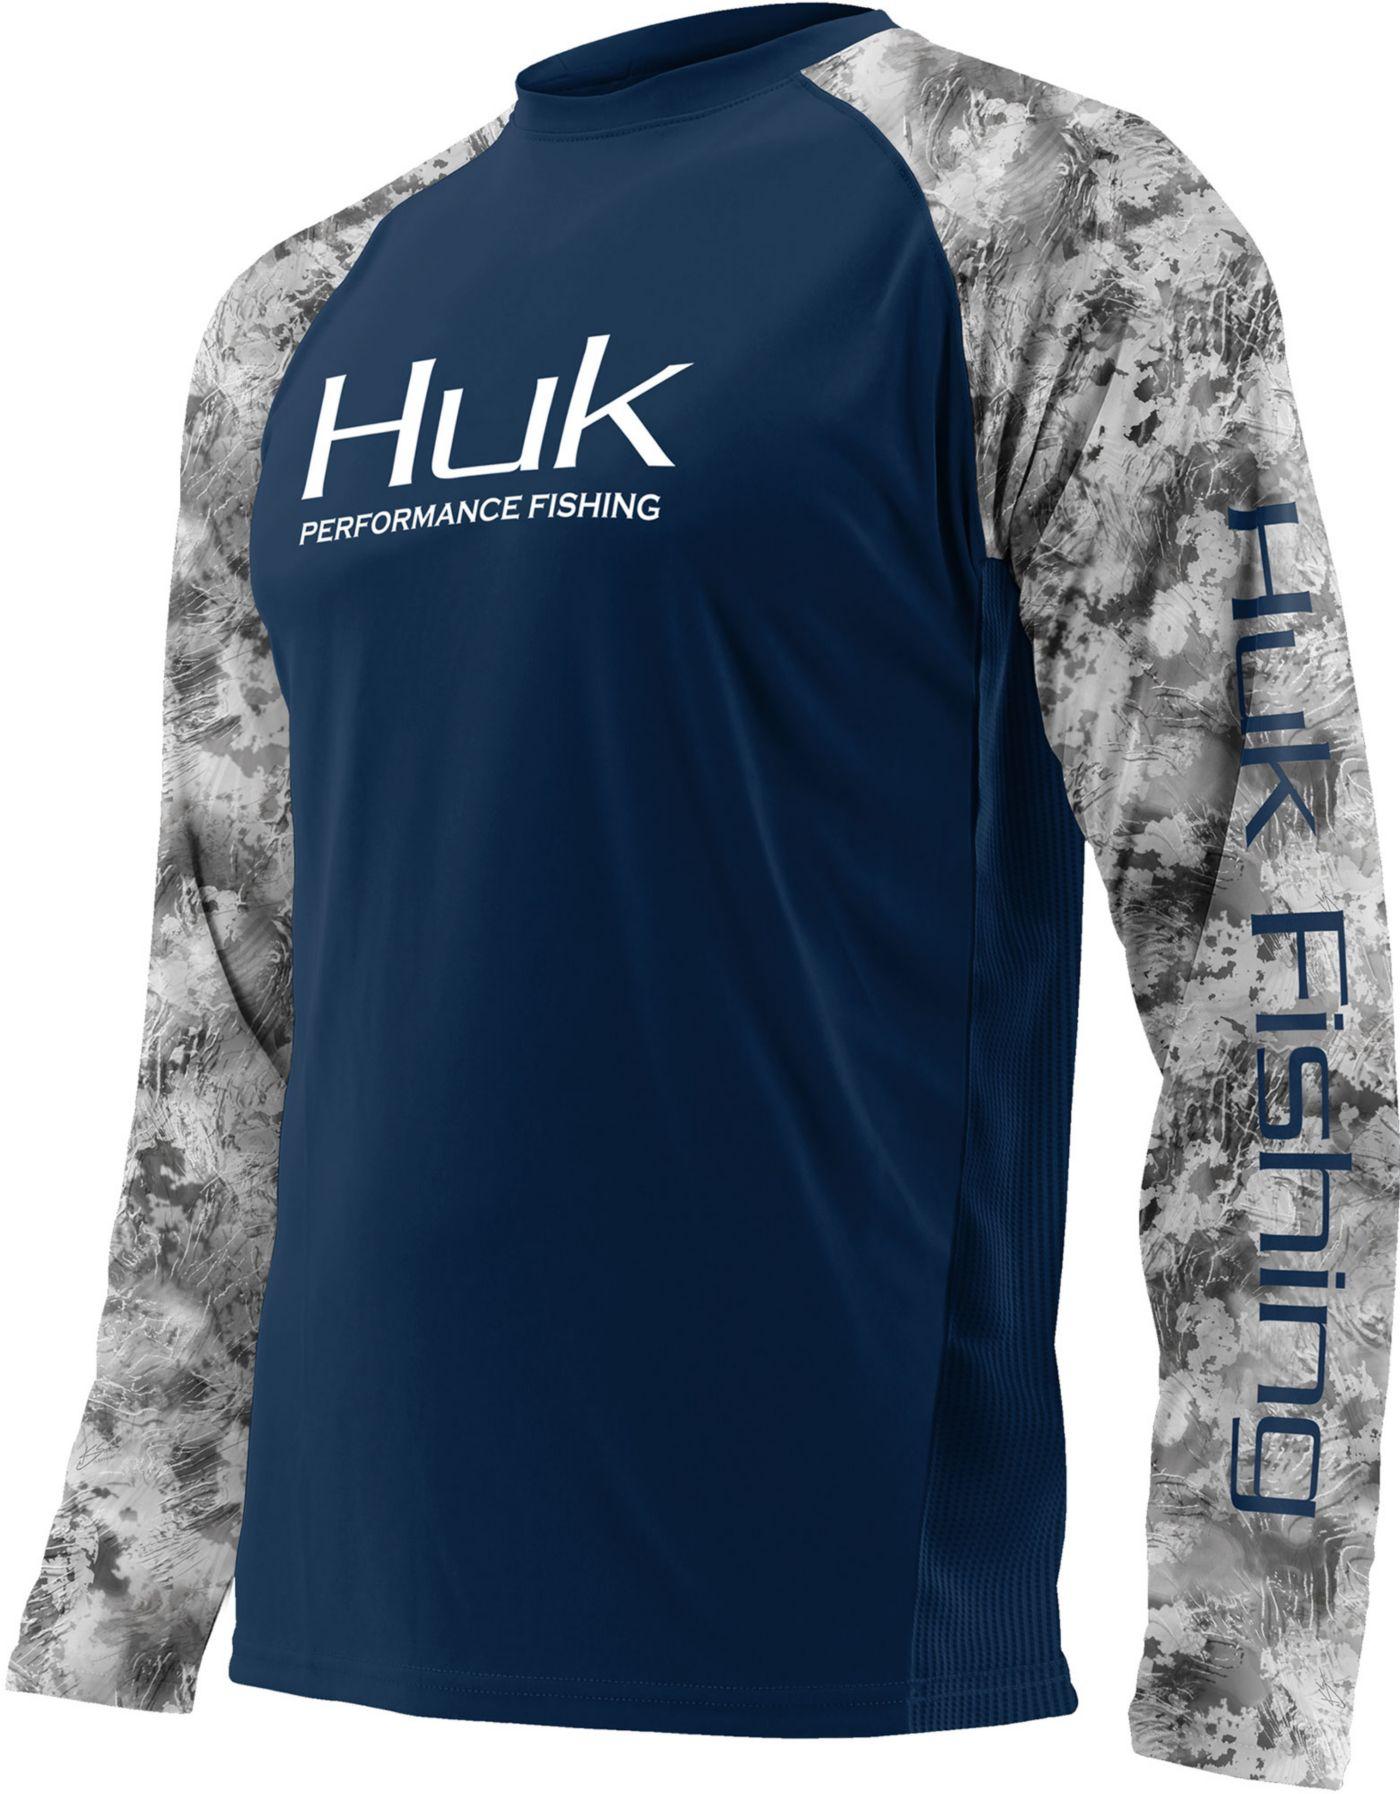 Huk Men's Performance Subphantis Double Header Vented Long Sleeve Shirt (Regular and Big & Tall)